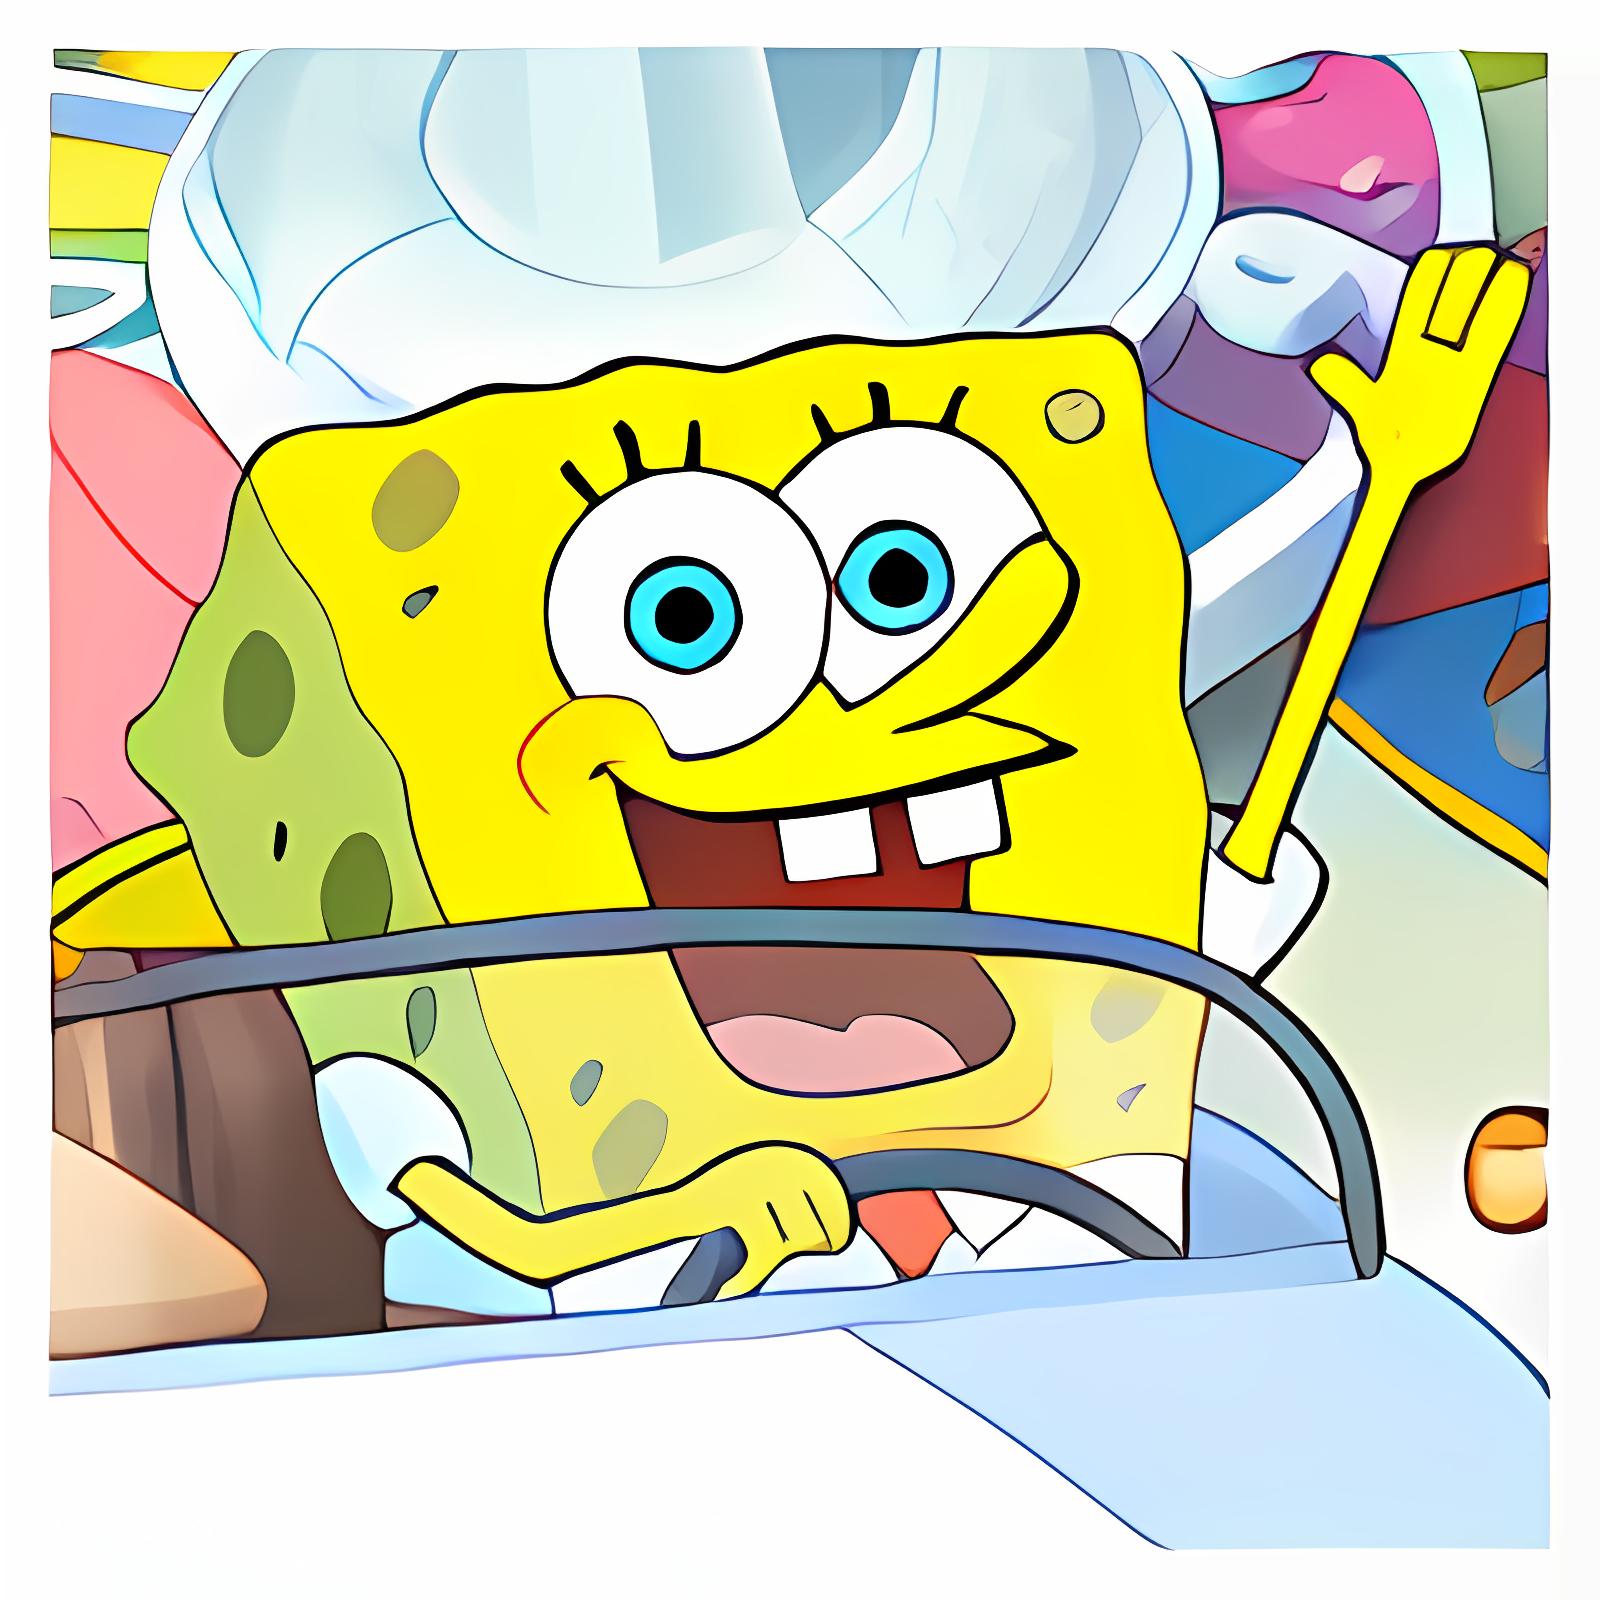 The Game of Life - SpongeBob SquarePants Edition